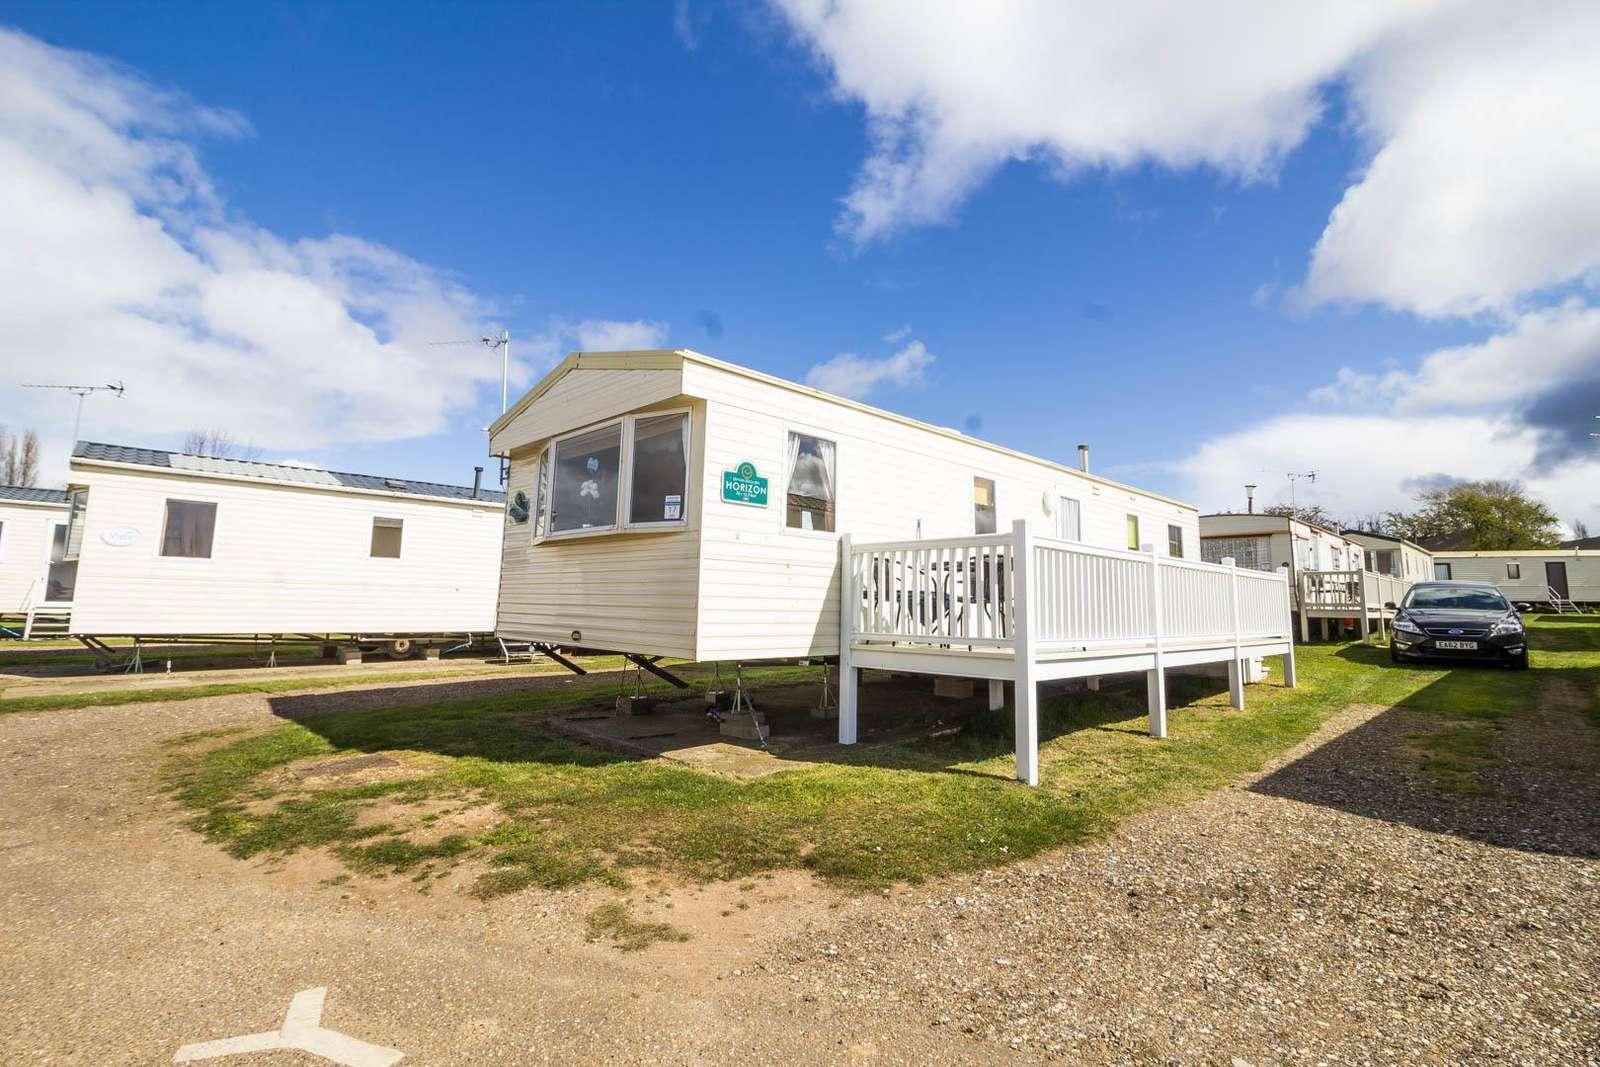 23017S – Sandringham area, 3 bed, 6 berth caravan with decking. Emerald rated. - property